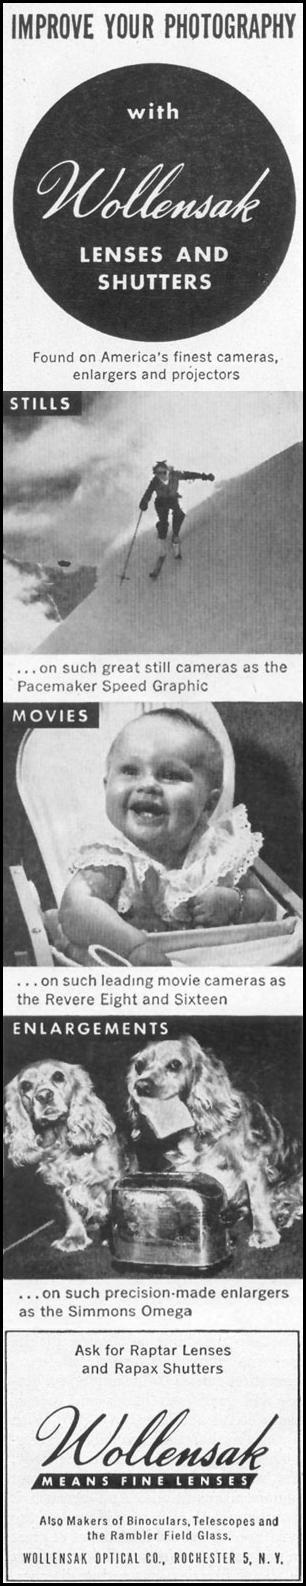 RAPTAR LENSES & RAPAX SHUTTERS LIFE 10/11/1948 p. 90